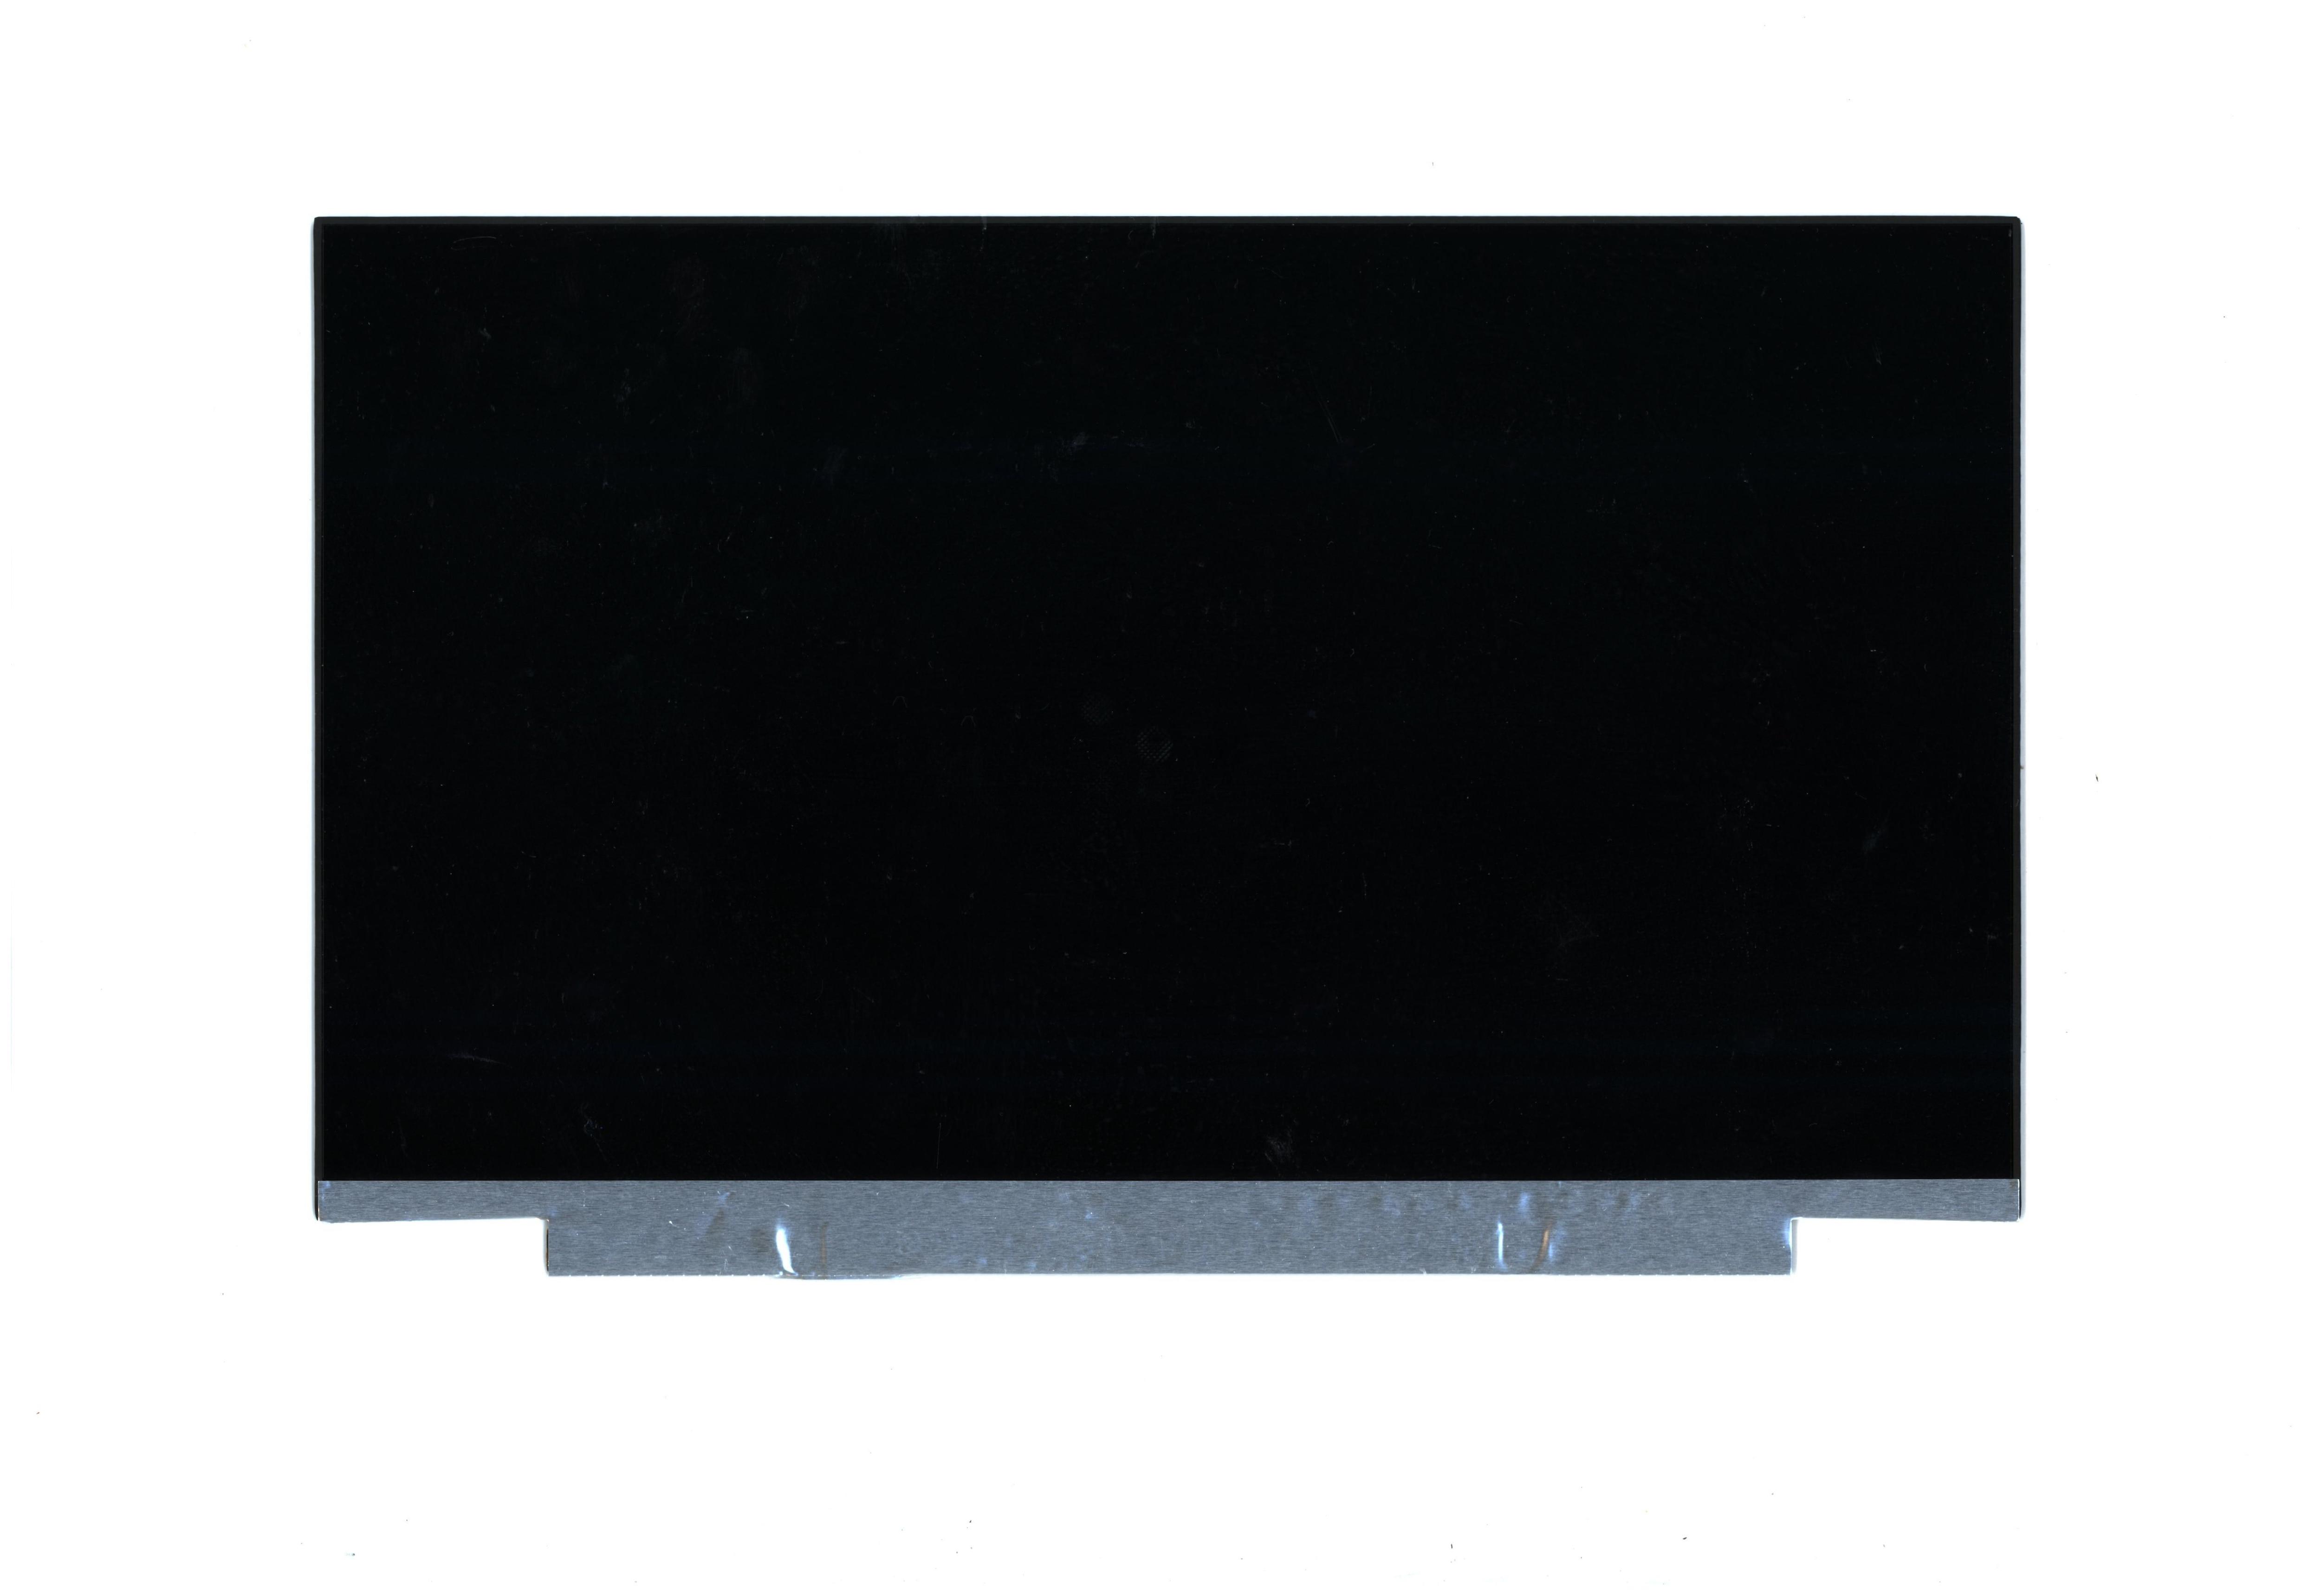 Original ordenador portátil Lenovo Thinkpad T480 X1 carbono 6th Gen LCD pantalla 2560*1440 WQHD IPS mate 40pin 00NY664 00NY681 01YN128